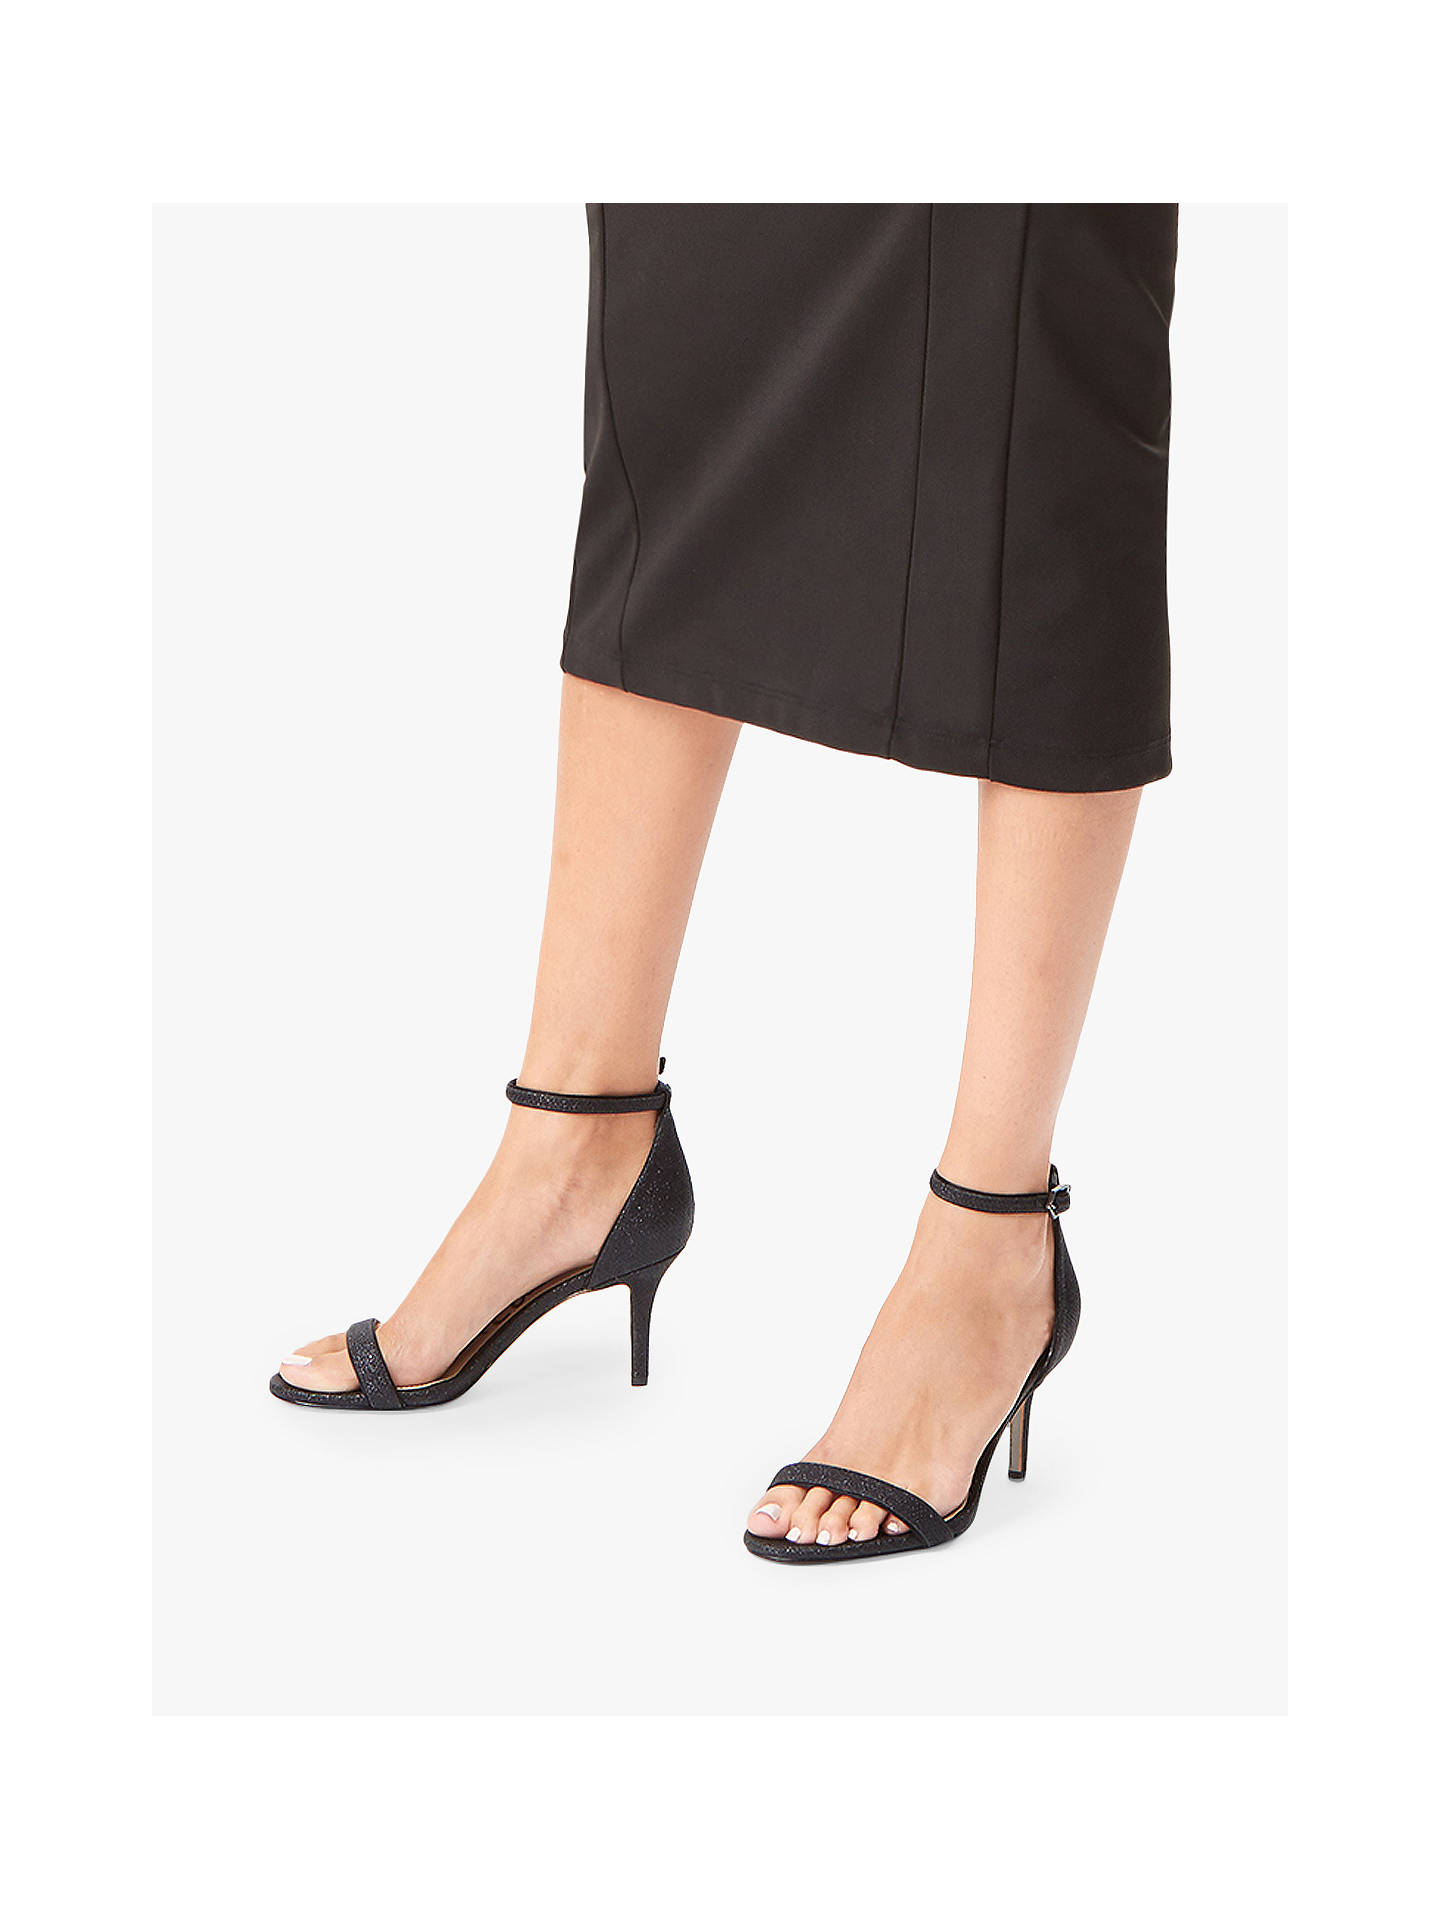 1b39b527e326 Buy Sam Edelman Patti Ankle Strap Heeled Sandals